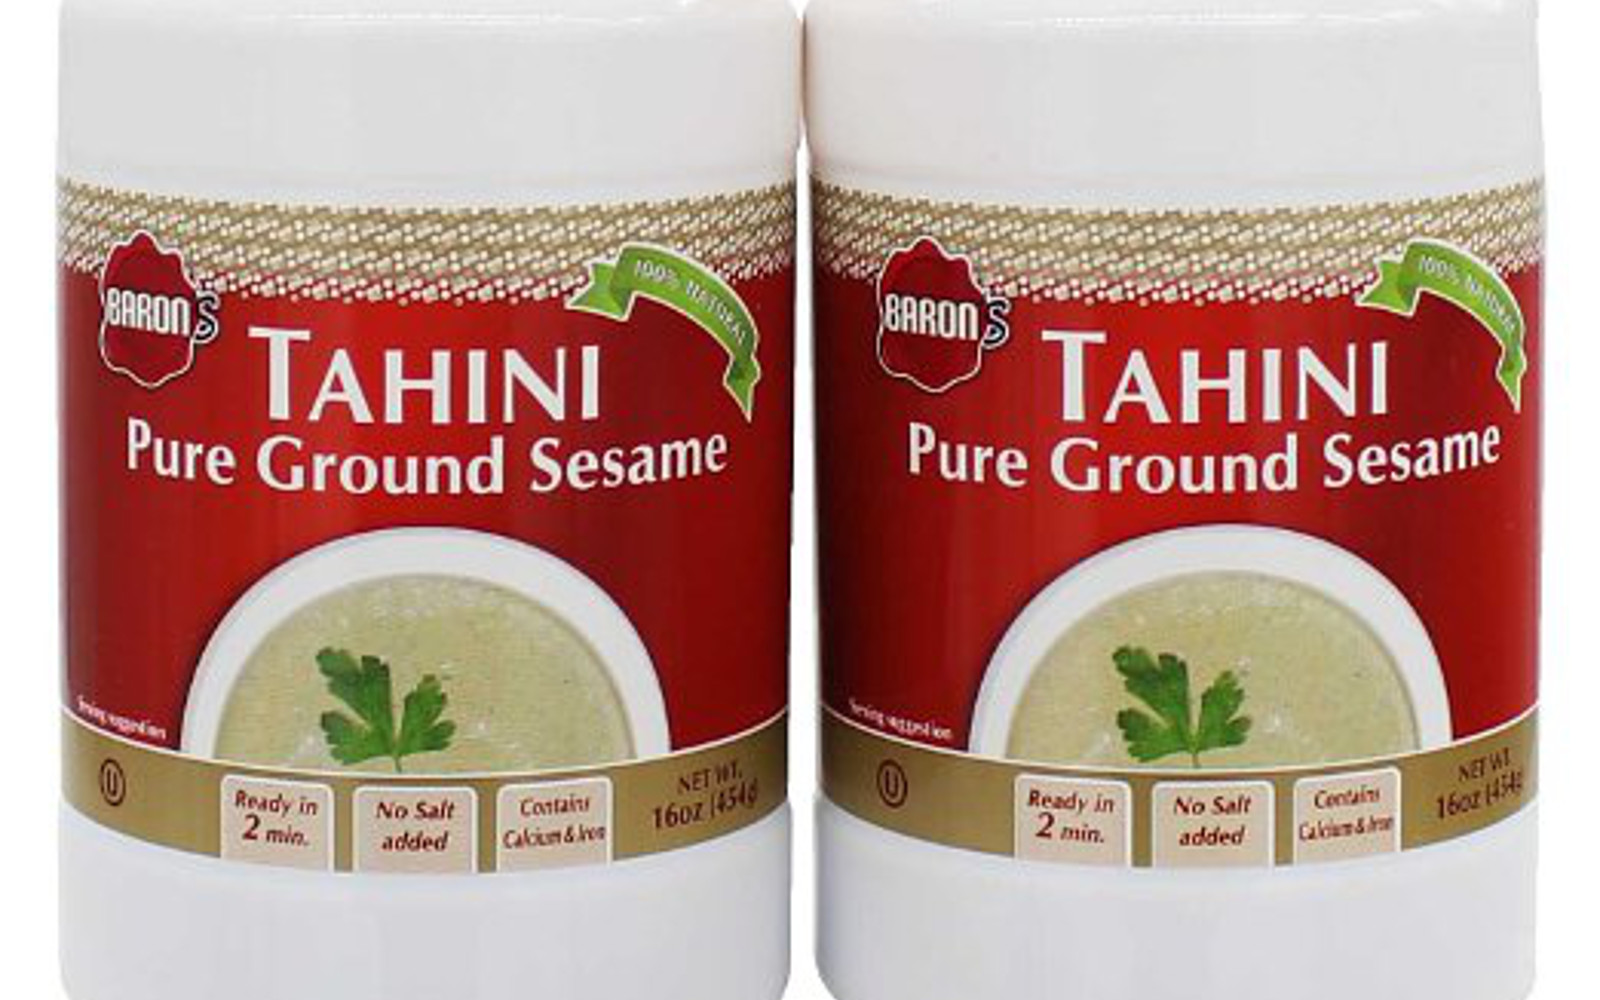 Baron's Kosher 100% Pure Ground Sesame Tahini 16-ounce Jars (Pack of 2)